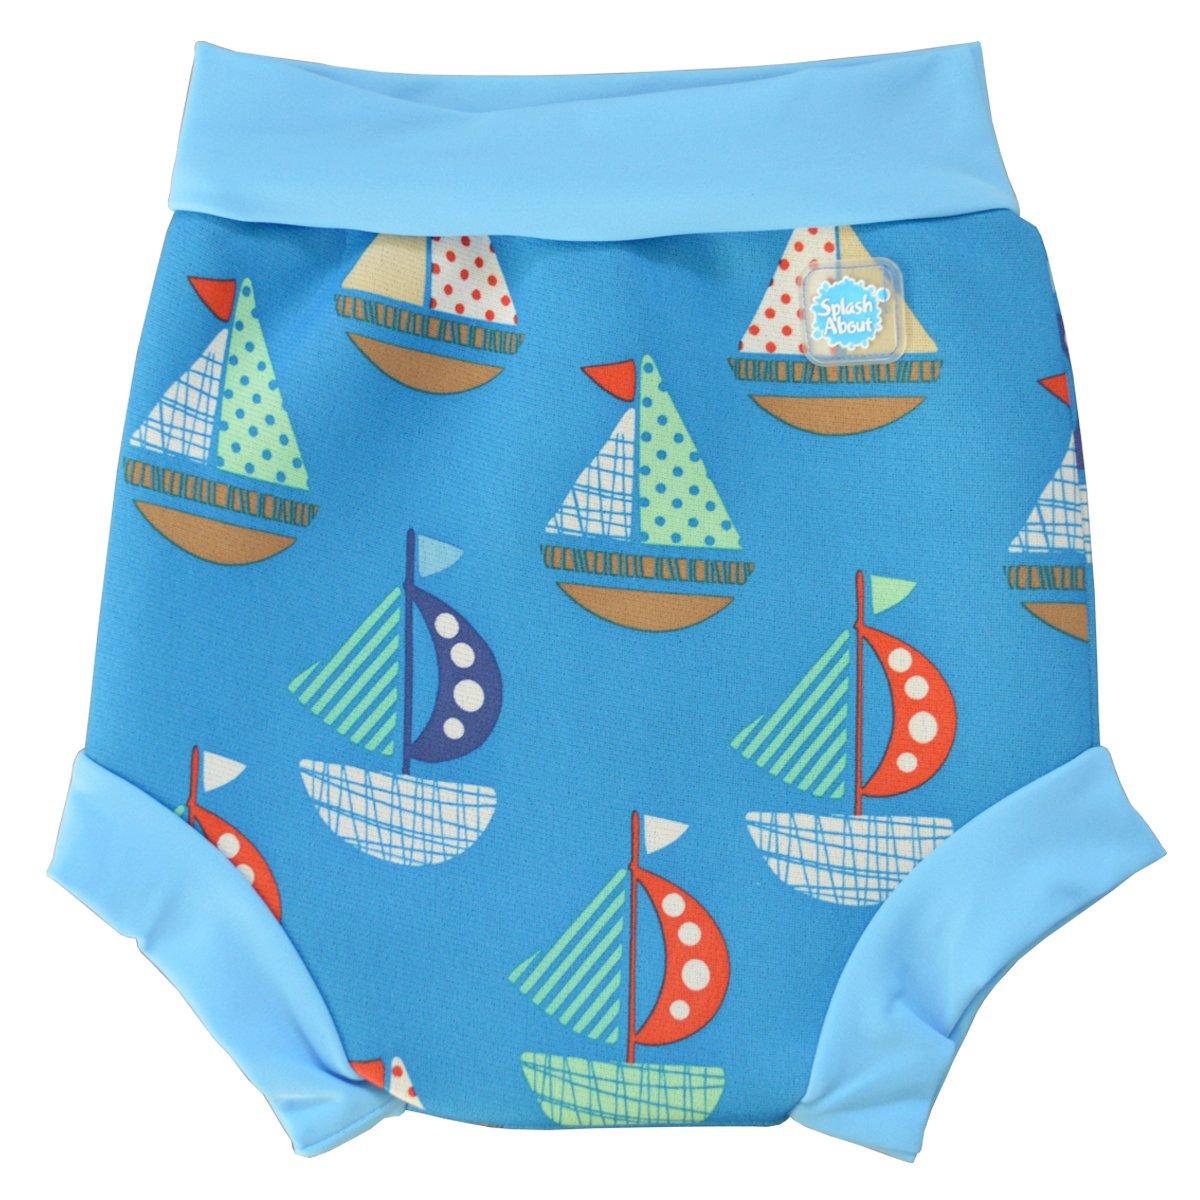 Splash About neoprene Happy Nappy (Swim Diaper), Navy with Red & White stripe, XS (Premature to 2 mths) HNNRSXS